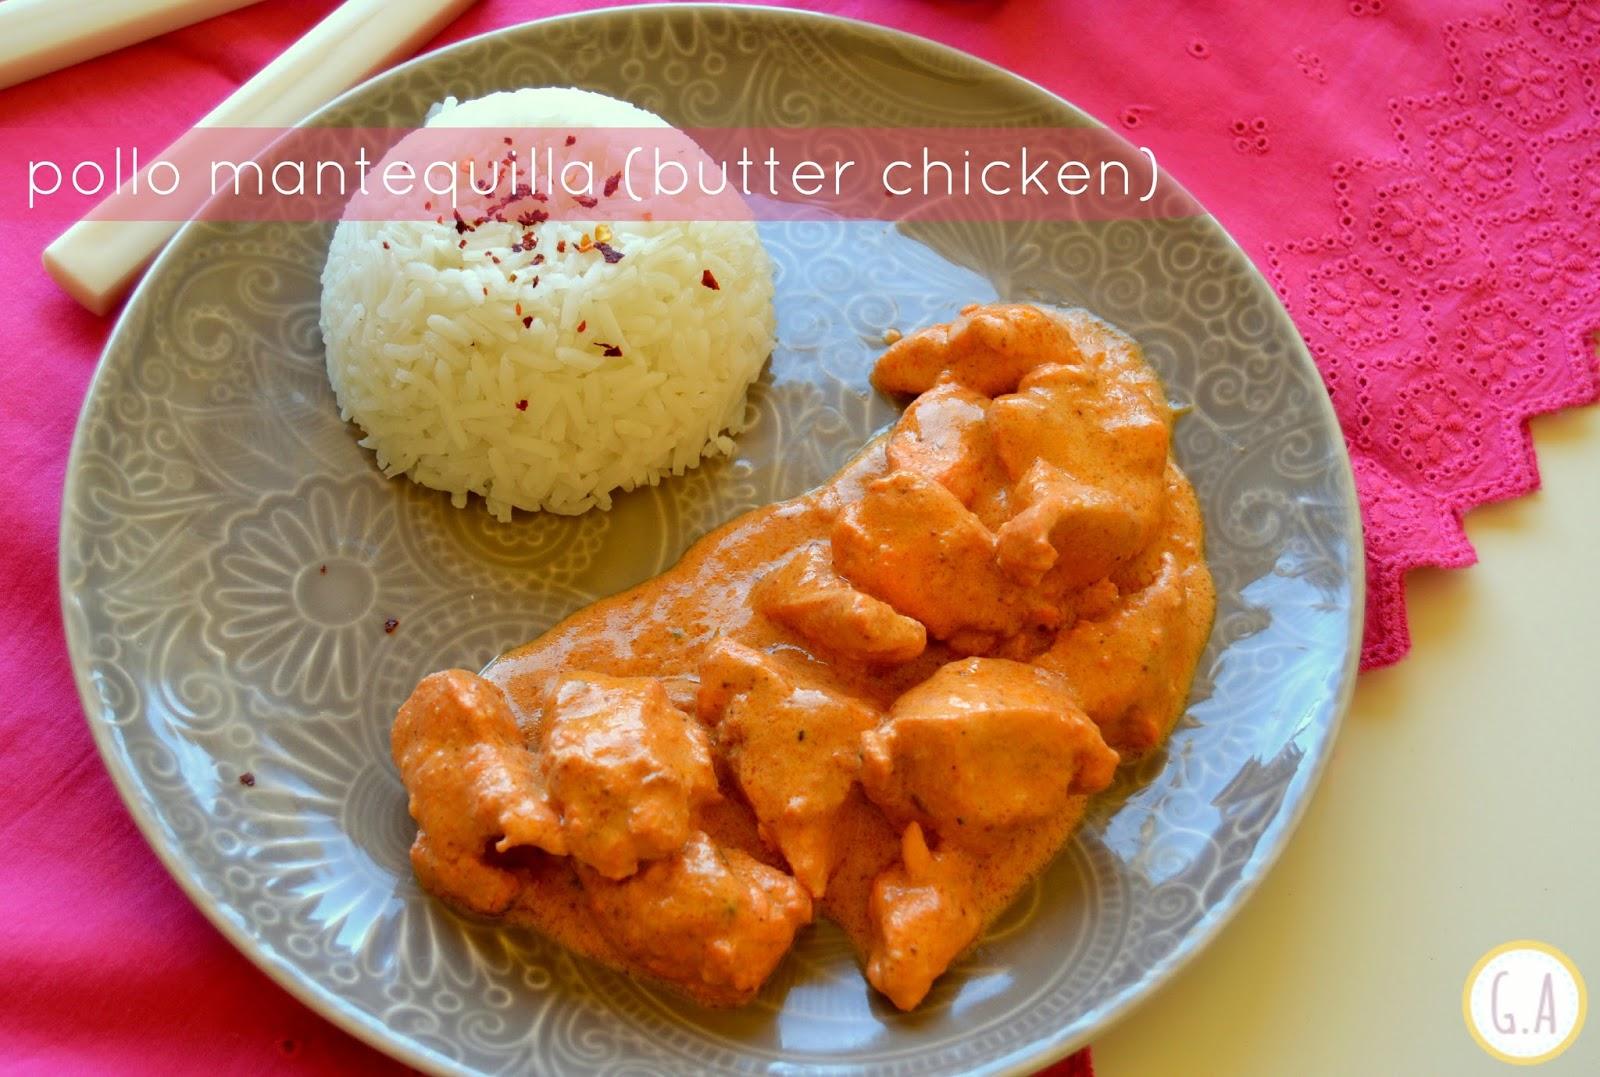 Cocinar Con Jengibre Fresco | Pollo Mantequilla Rapido Butter Chicken Gastroandalusi